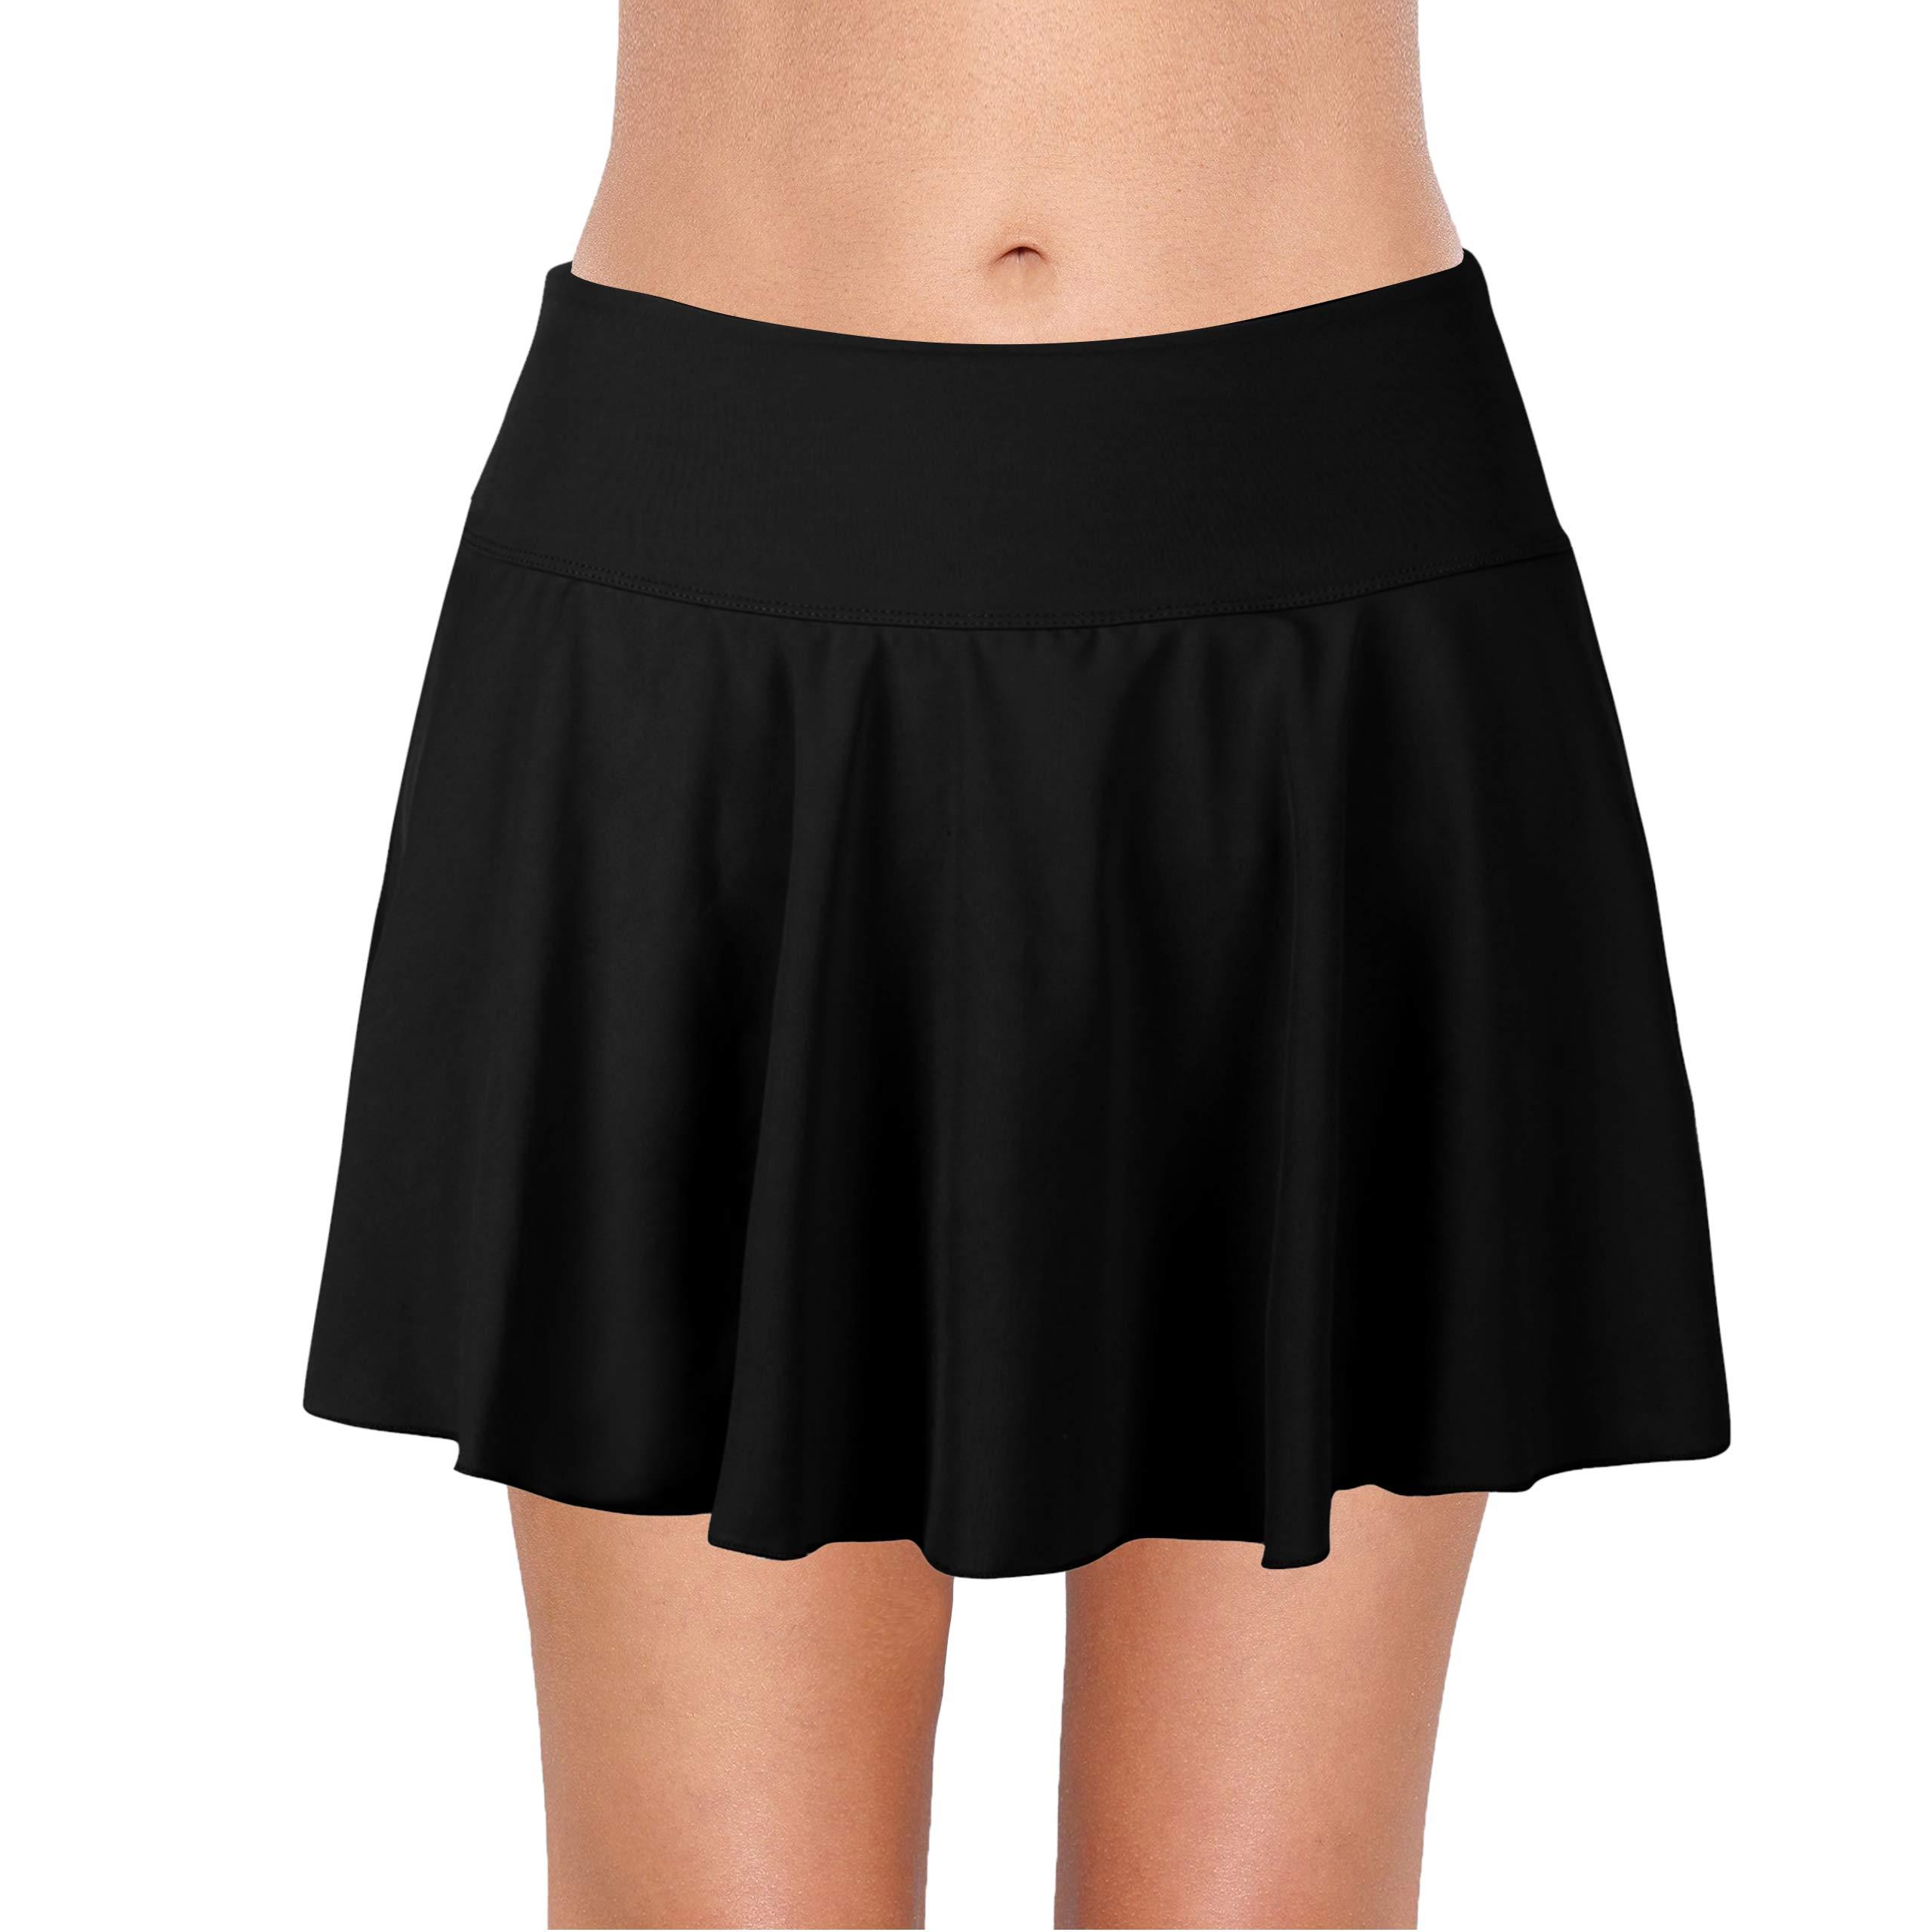 Saejous Women's Athletic Swim Skirt Plus Size Skirted Bikini Bottom Solid Color Vantage Tankini